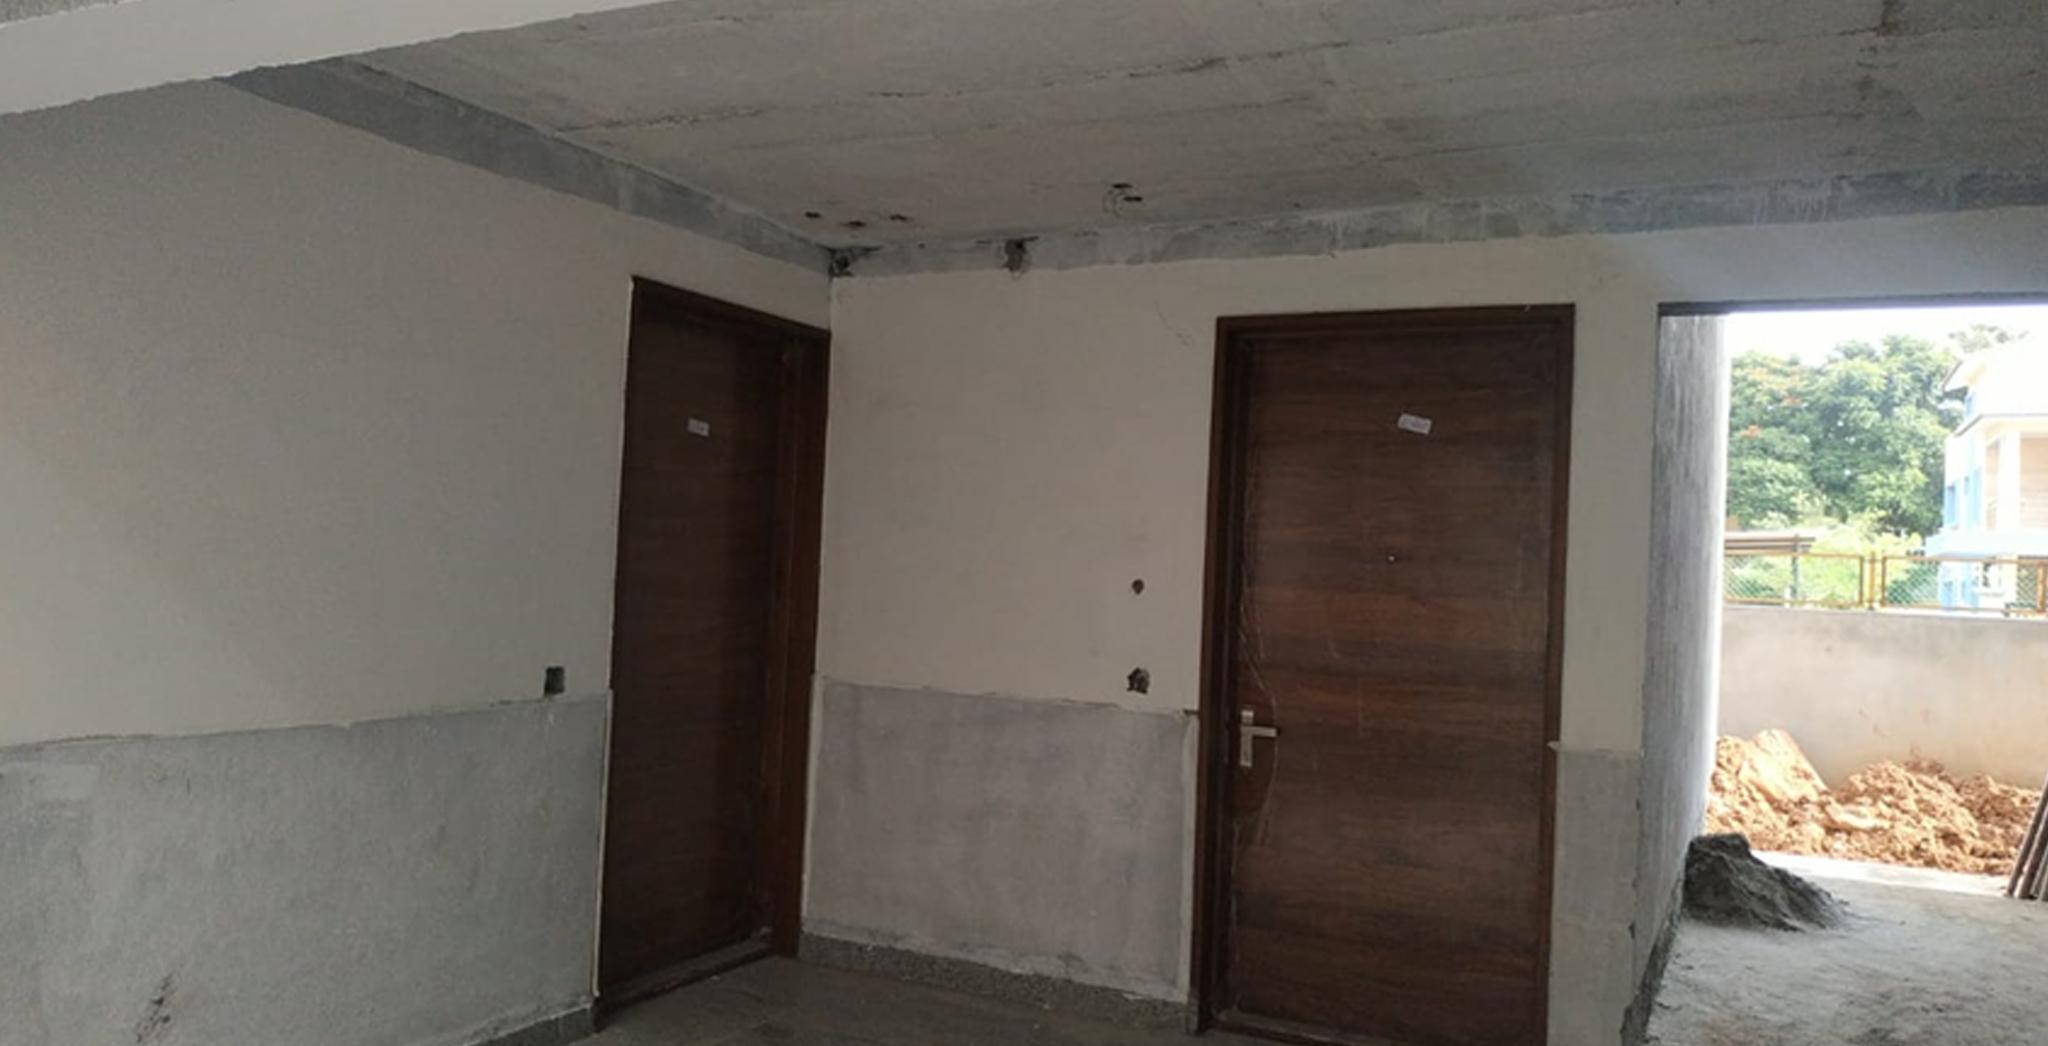 Aug 2021 - J Block: Lobby Painting work in progress